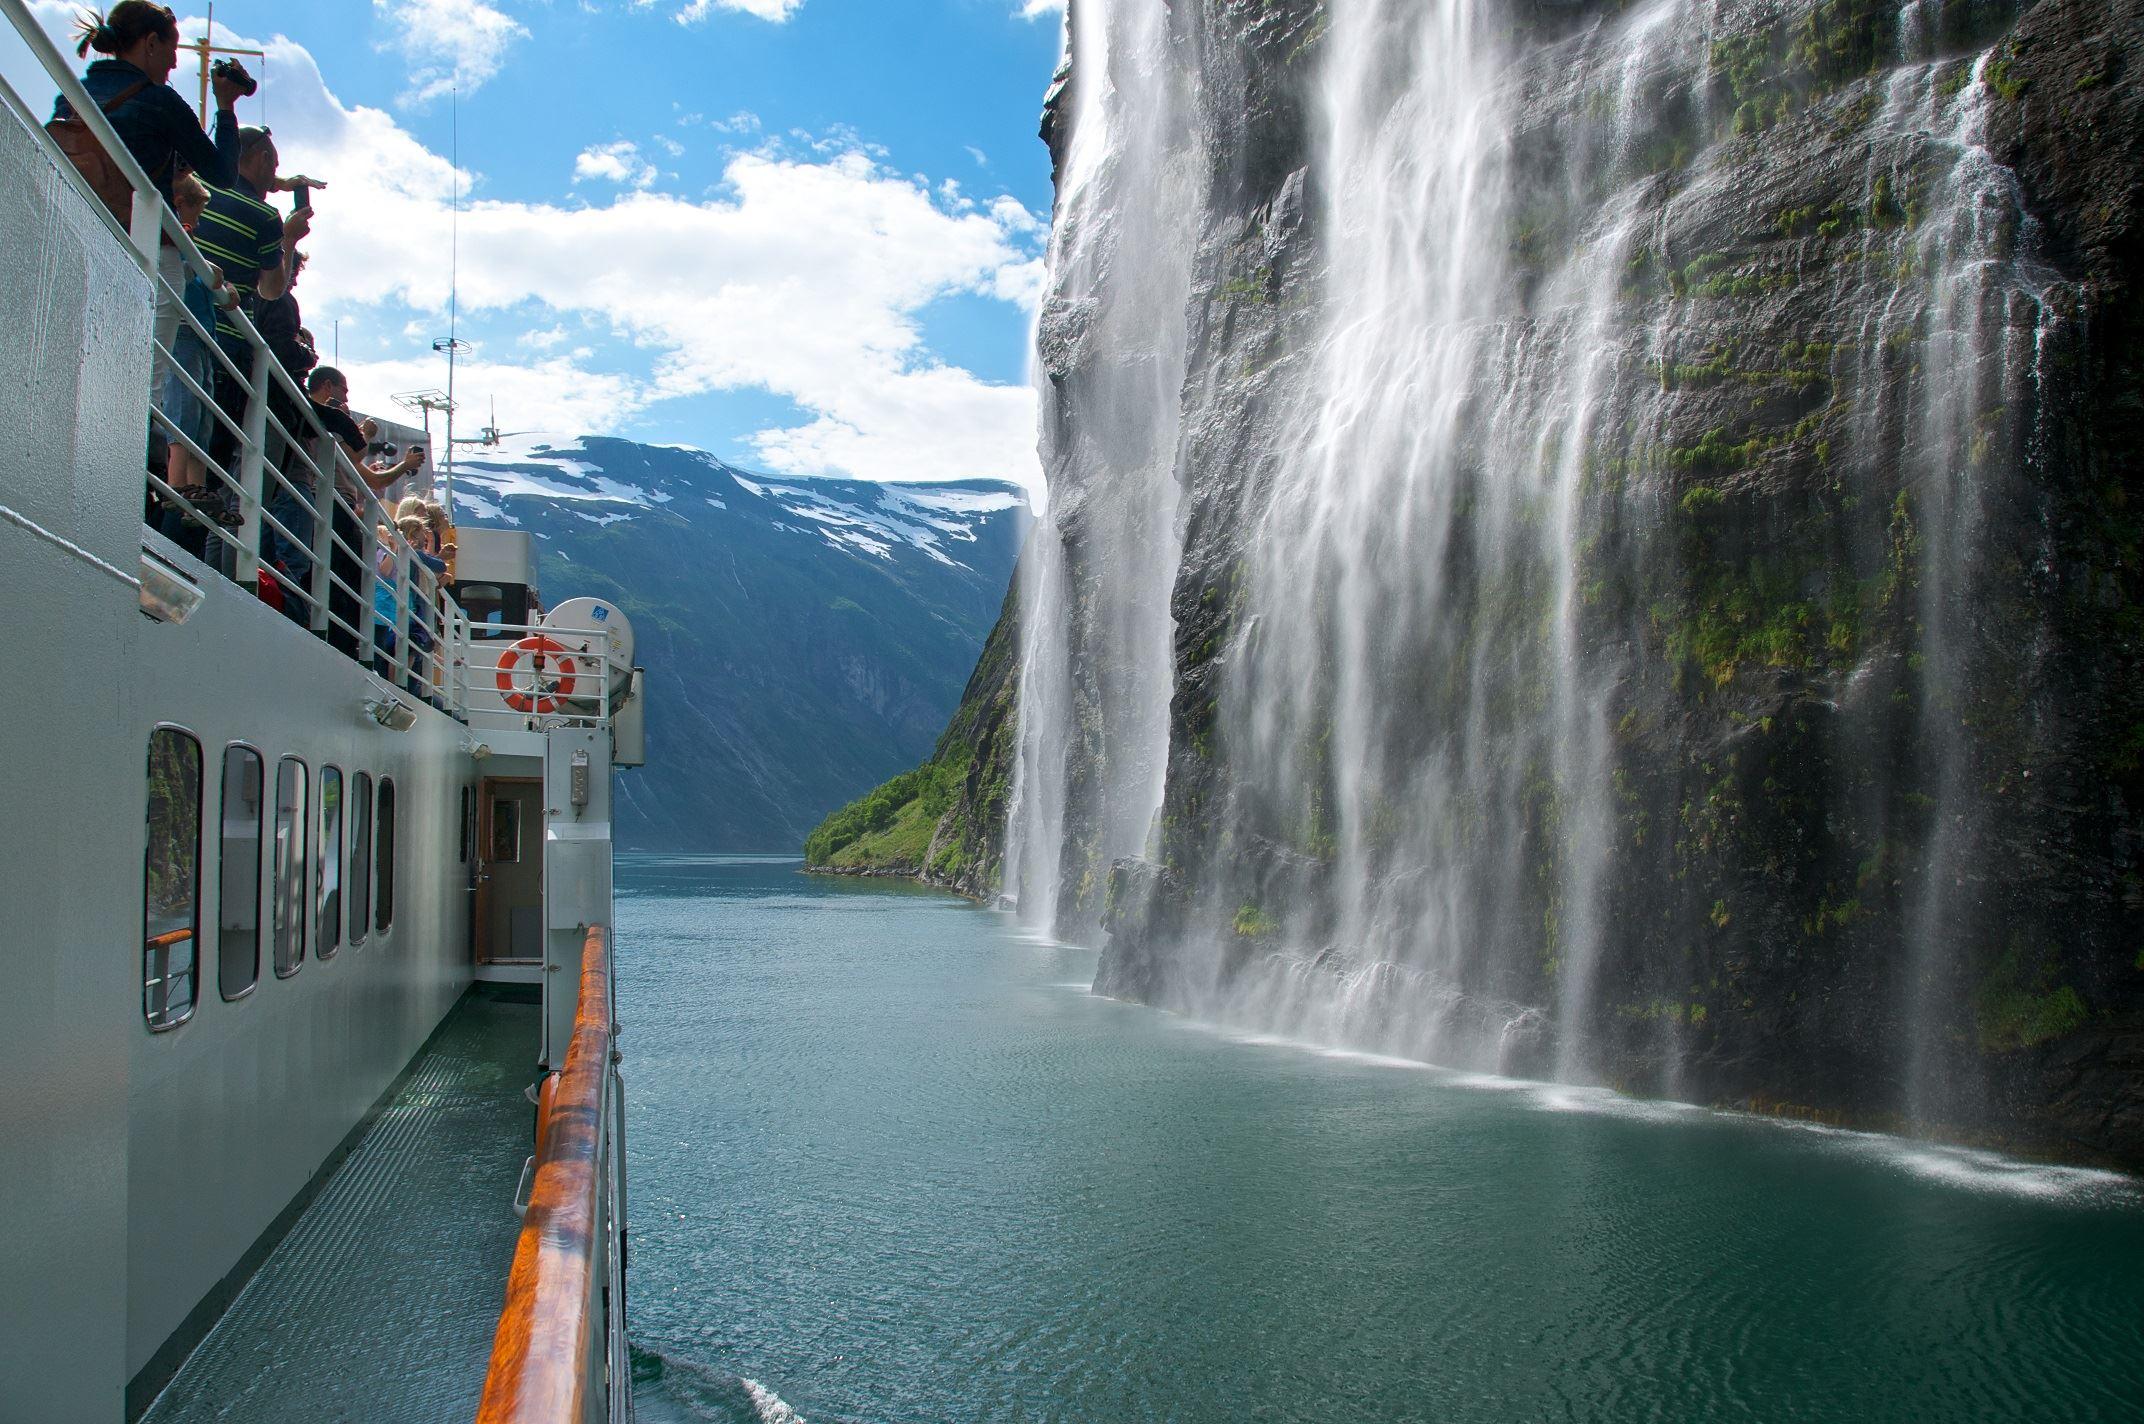 Øyvind Heen - Visitnorway.com, Fjord Cruise Geirangerfjord (copy)